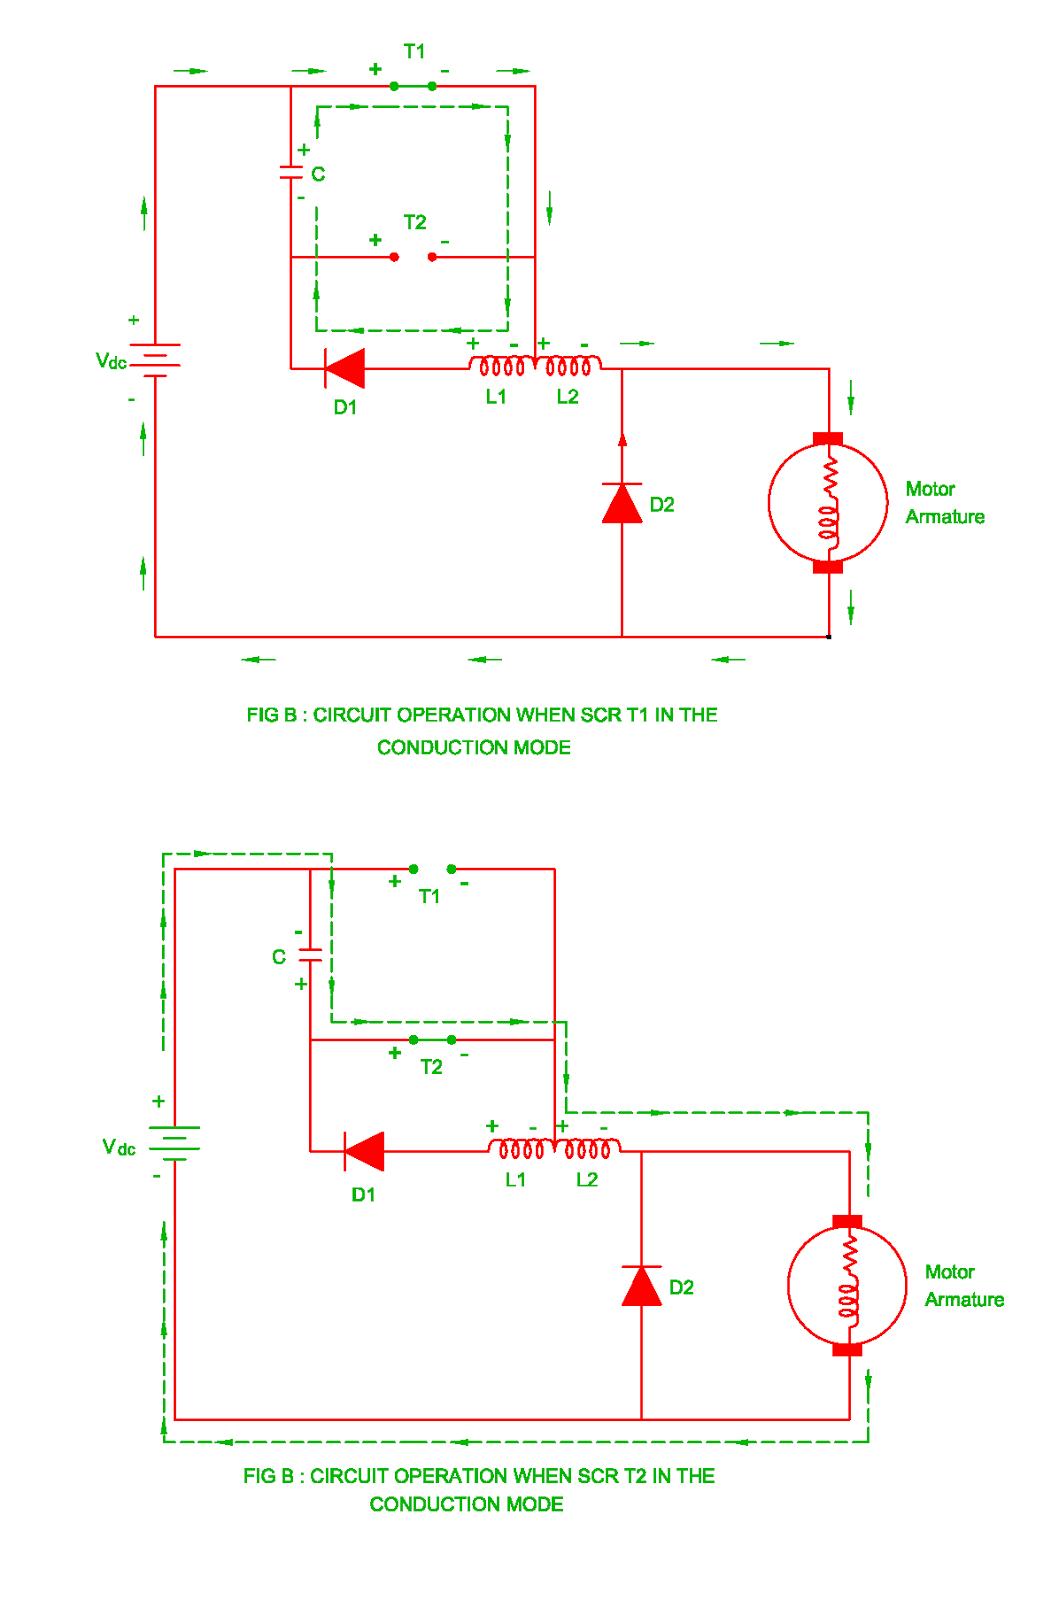 jones chopper electrical revolution v rod diagram circuit diagram jones chopper [ 1059 x 1600 Pixel ]